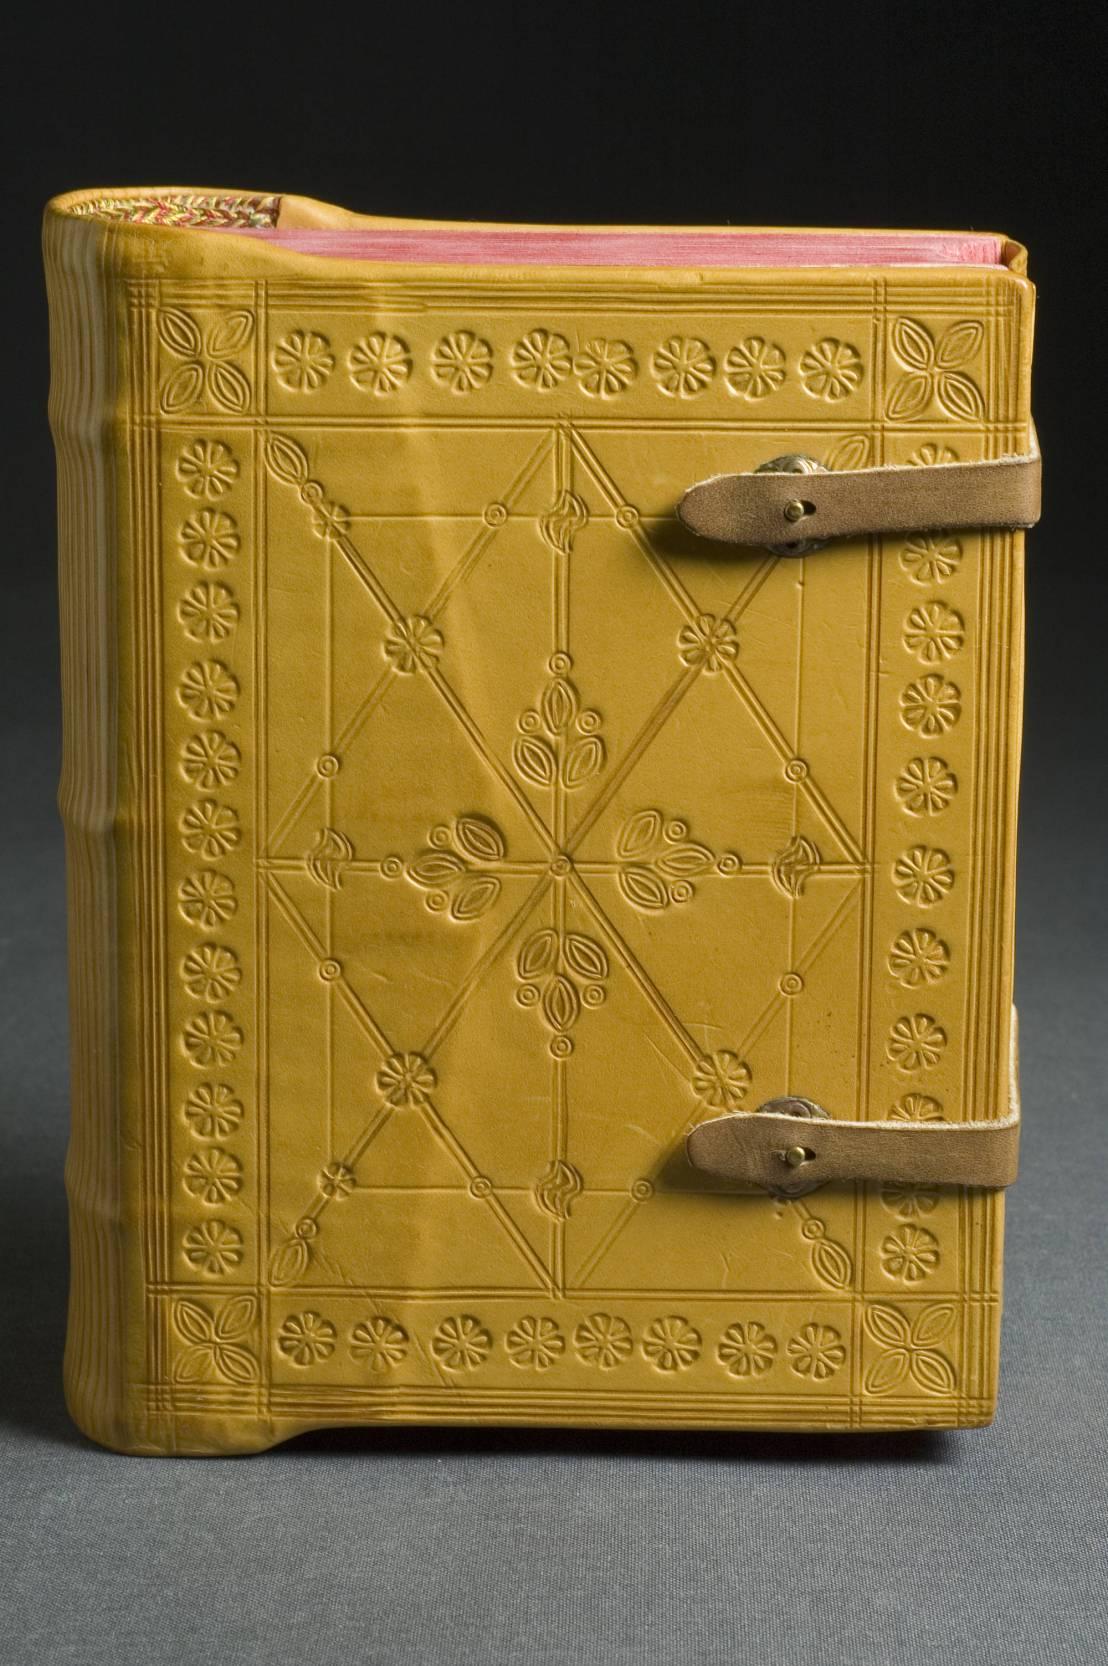 17th century Armenian binding